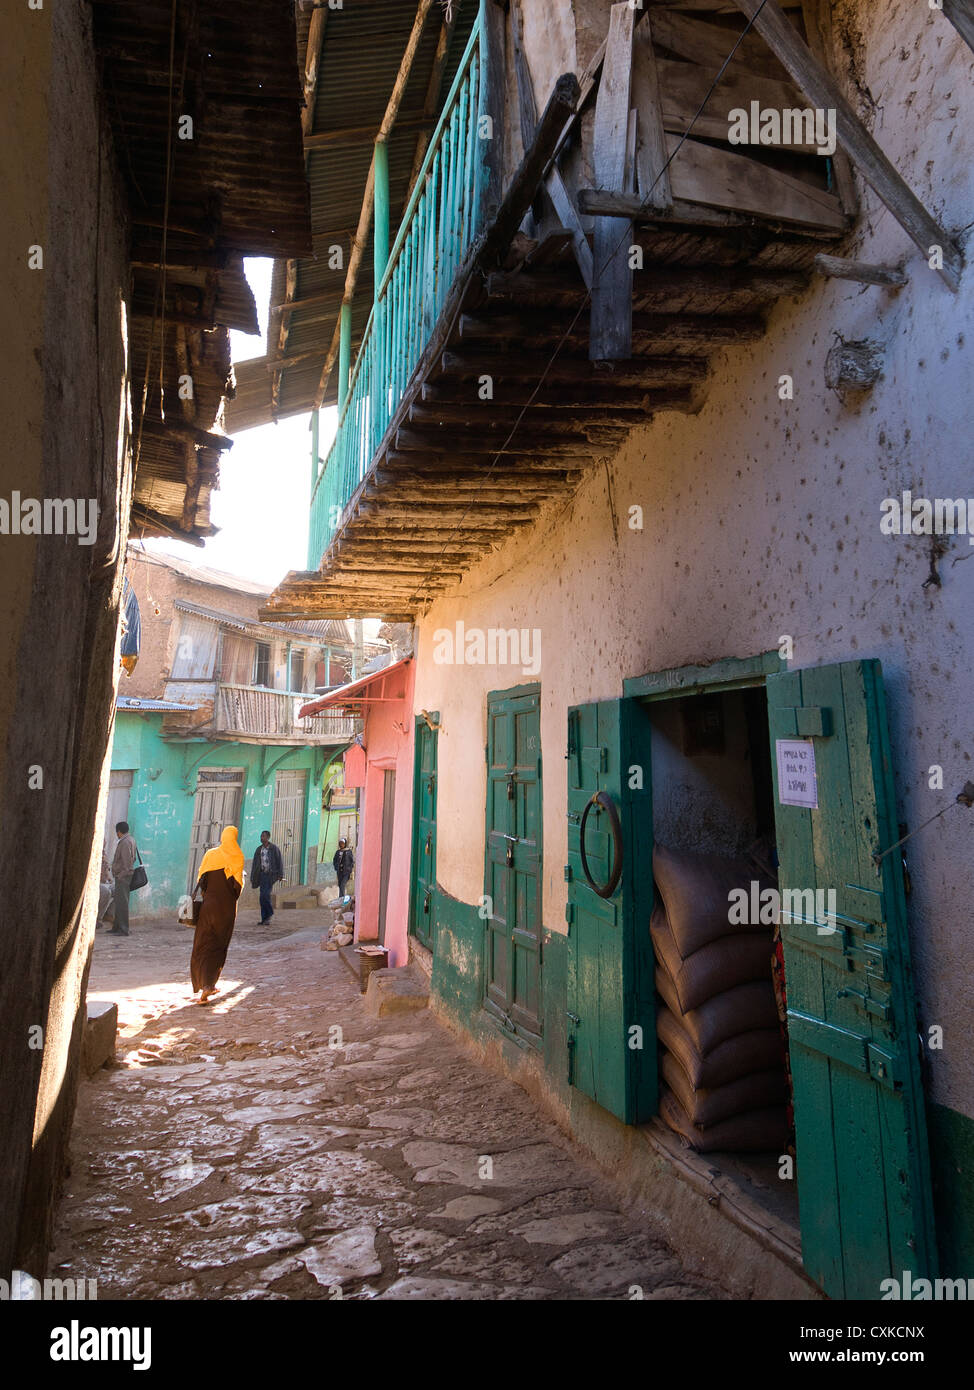 Elk200-4155v Äthiopien, Harar, Altstadt, Haus mit Balkon Stockbild